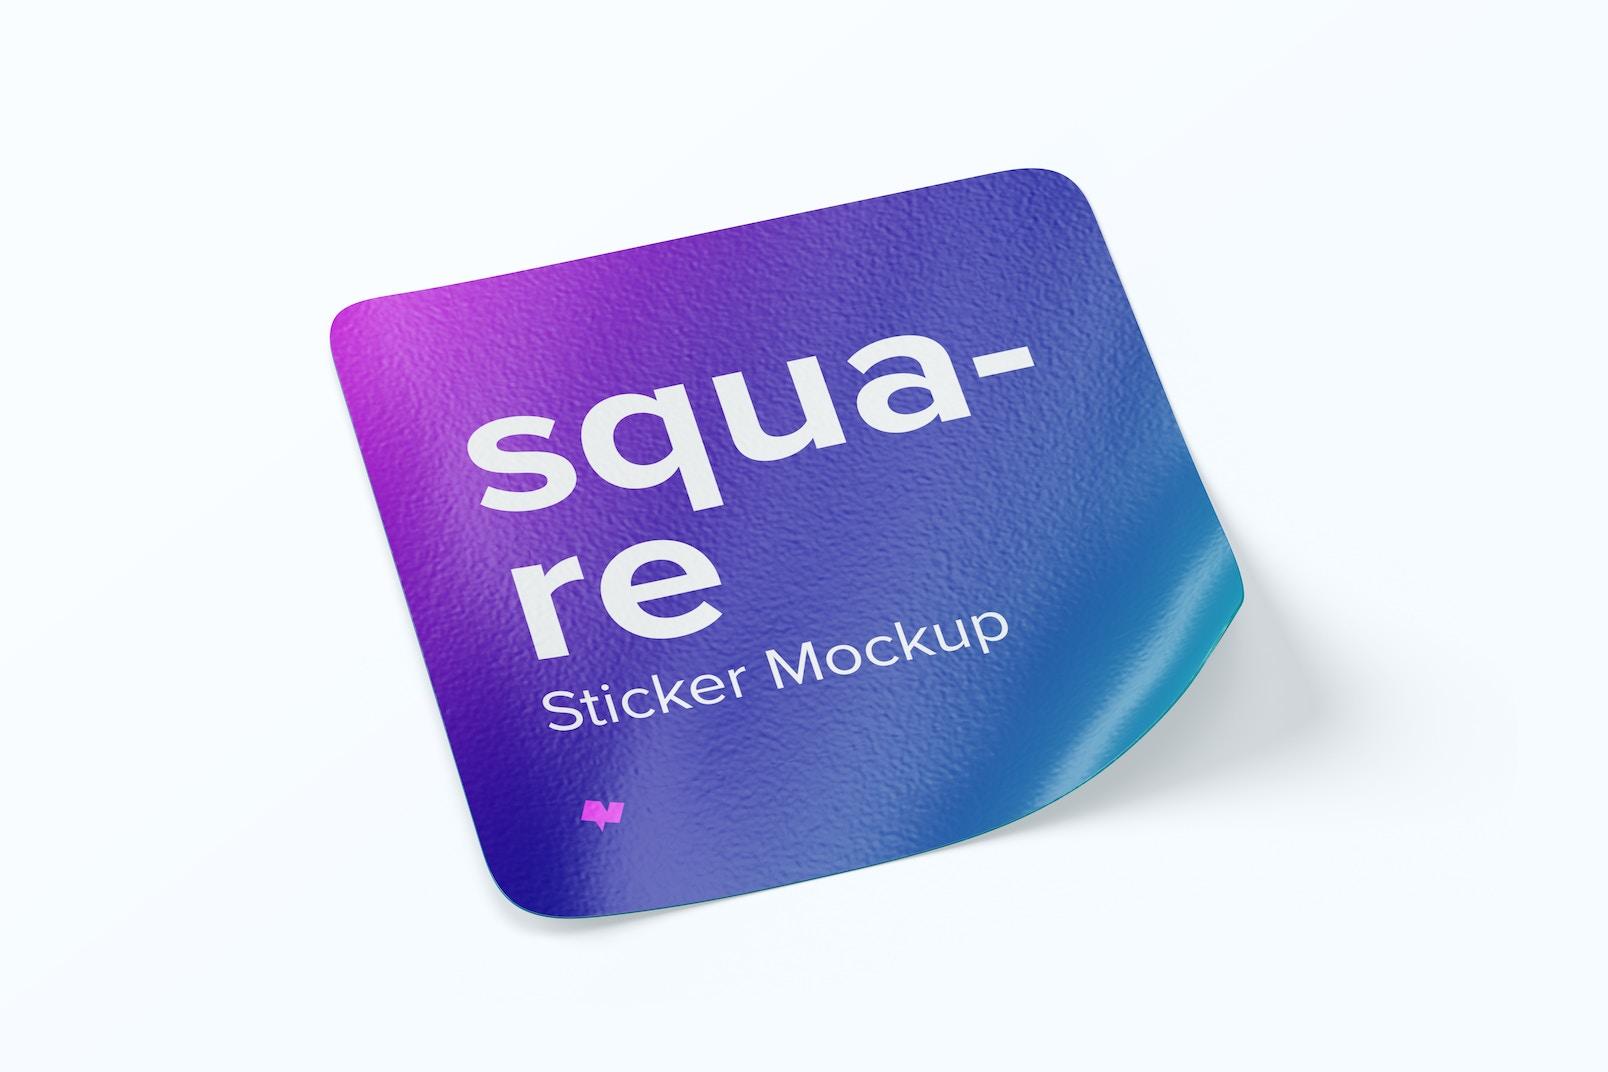 Square Sticker Mockup, Left View